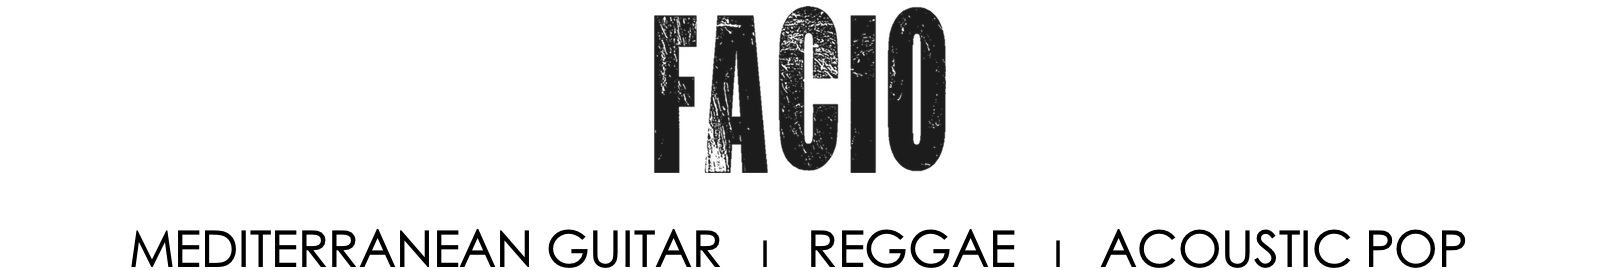 04_2016_logo_oben